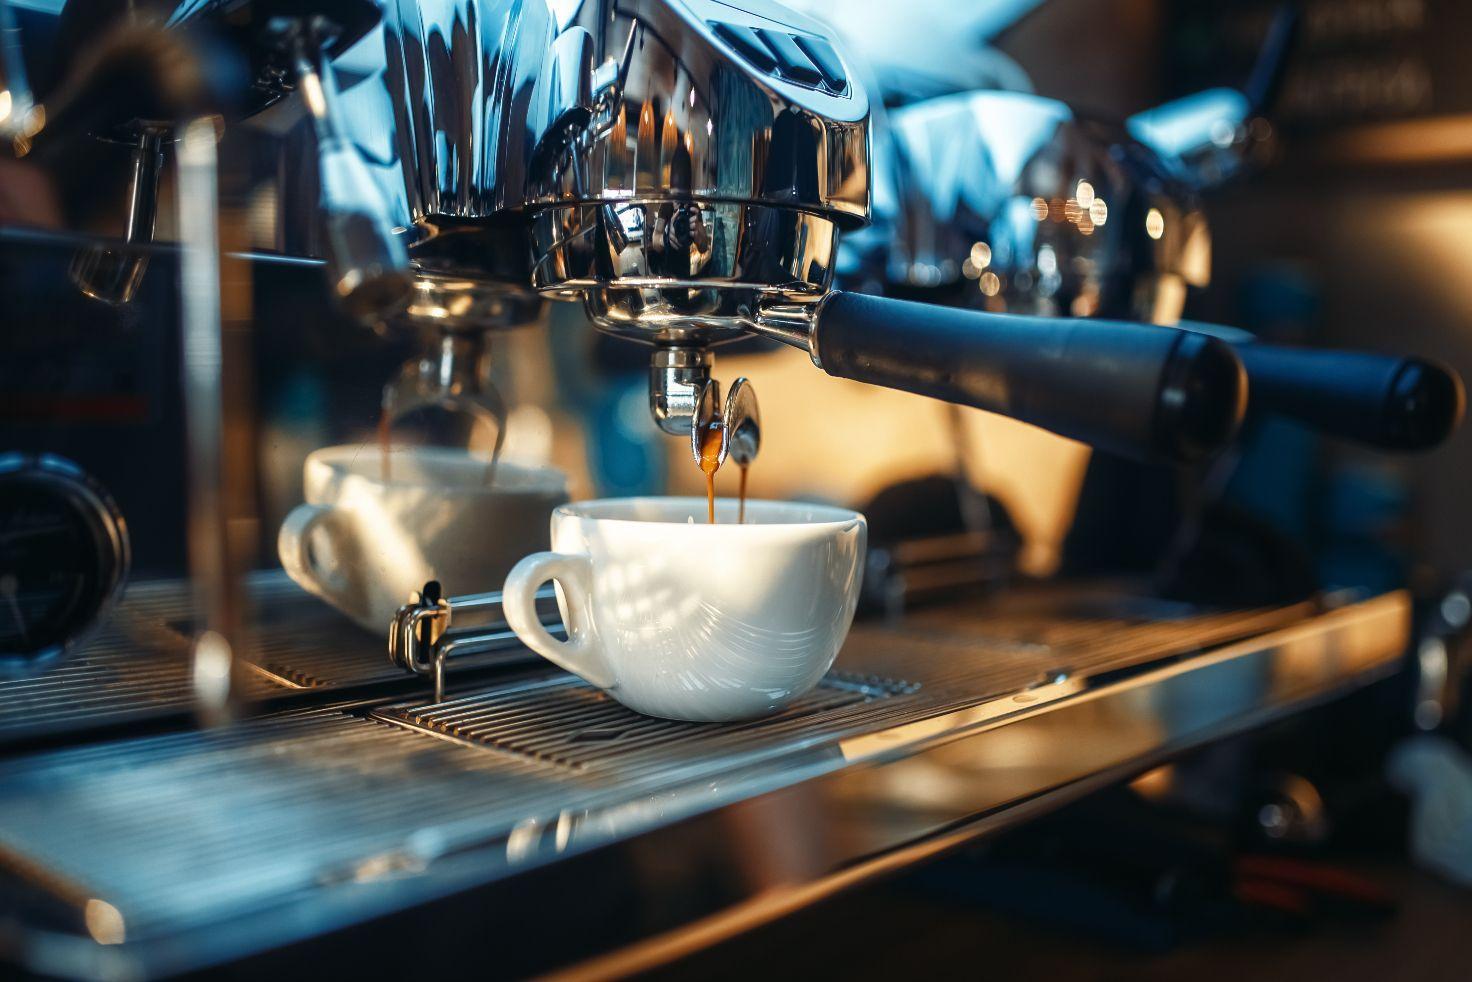 Café espresso cappuccino